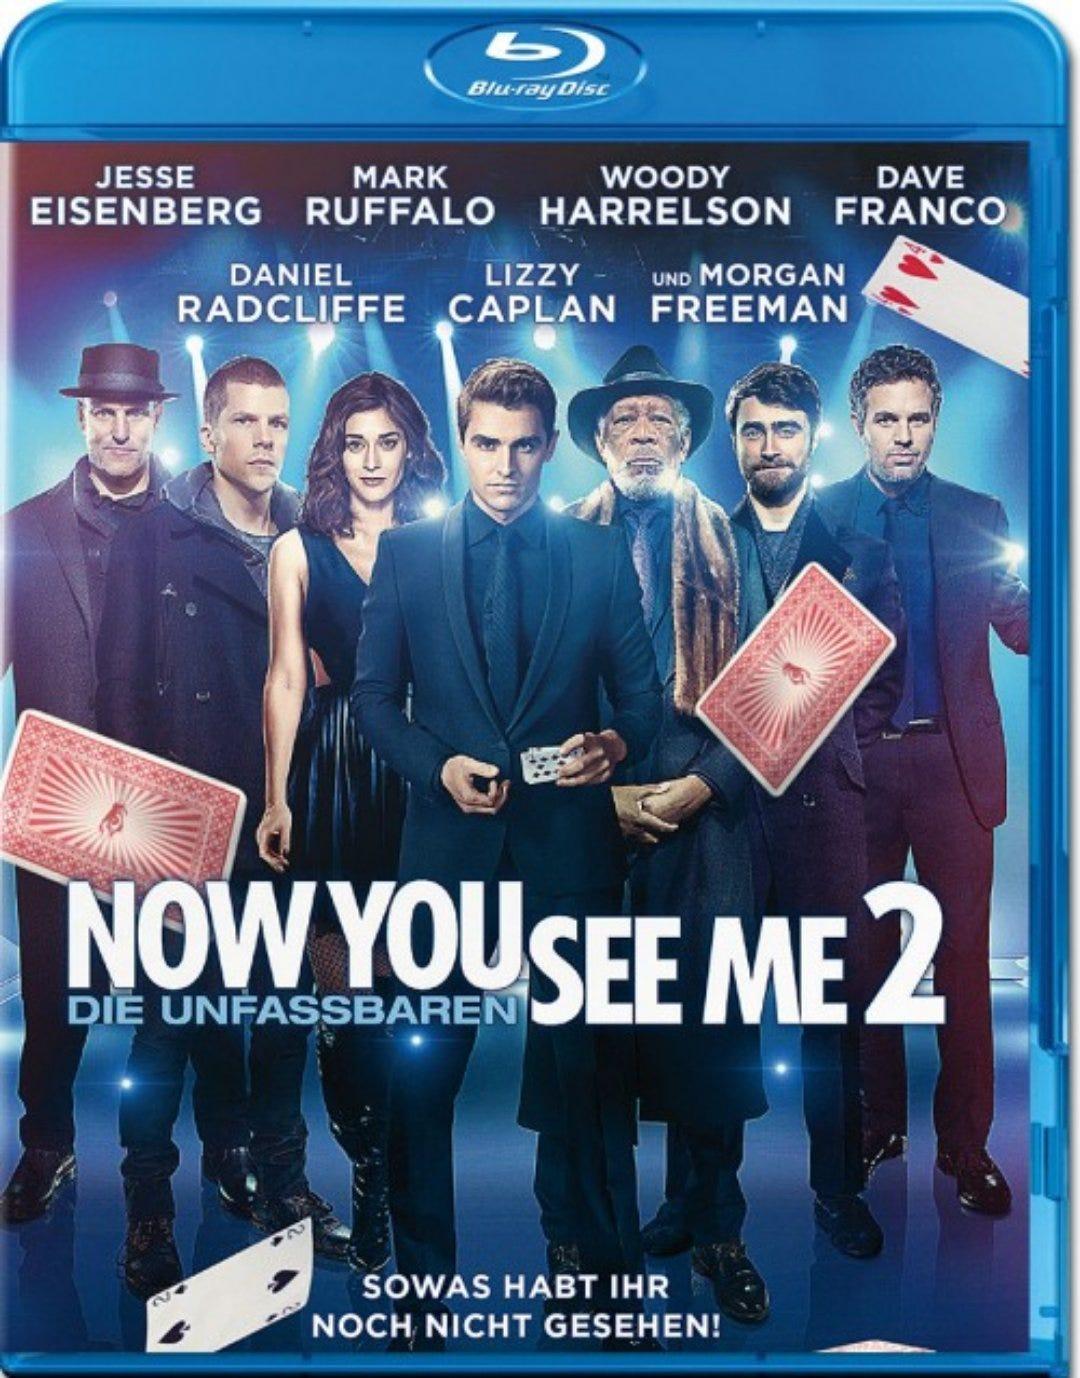 Download Film Now You See Me 2 Bluray 720p : download, bluray, English, HDRip, Movie, Download, Hknaim, Medium